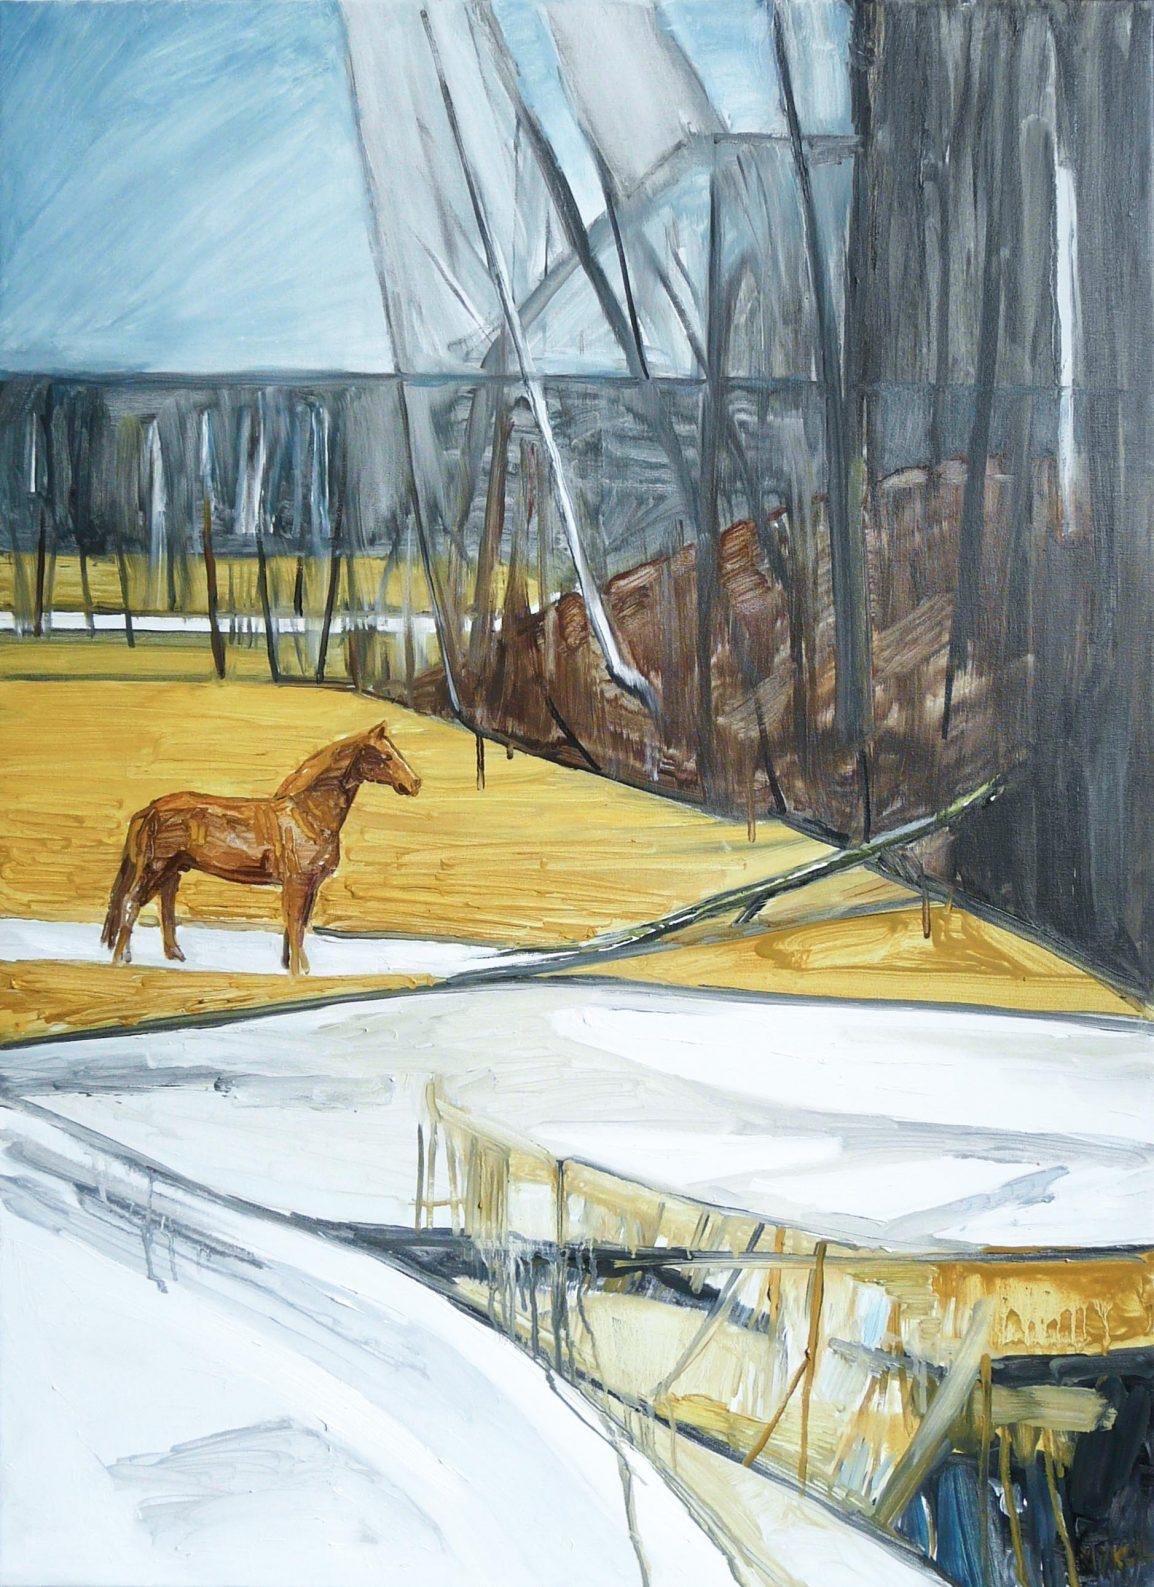 Horses 4-4, 2016. Oil, canvas. 90 x 65 cm